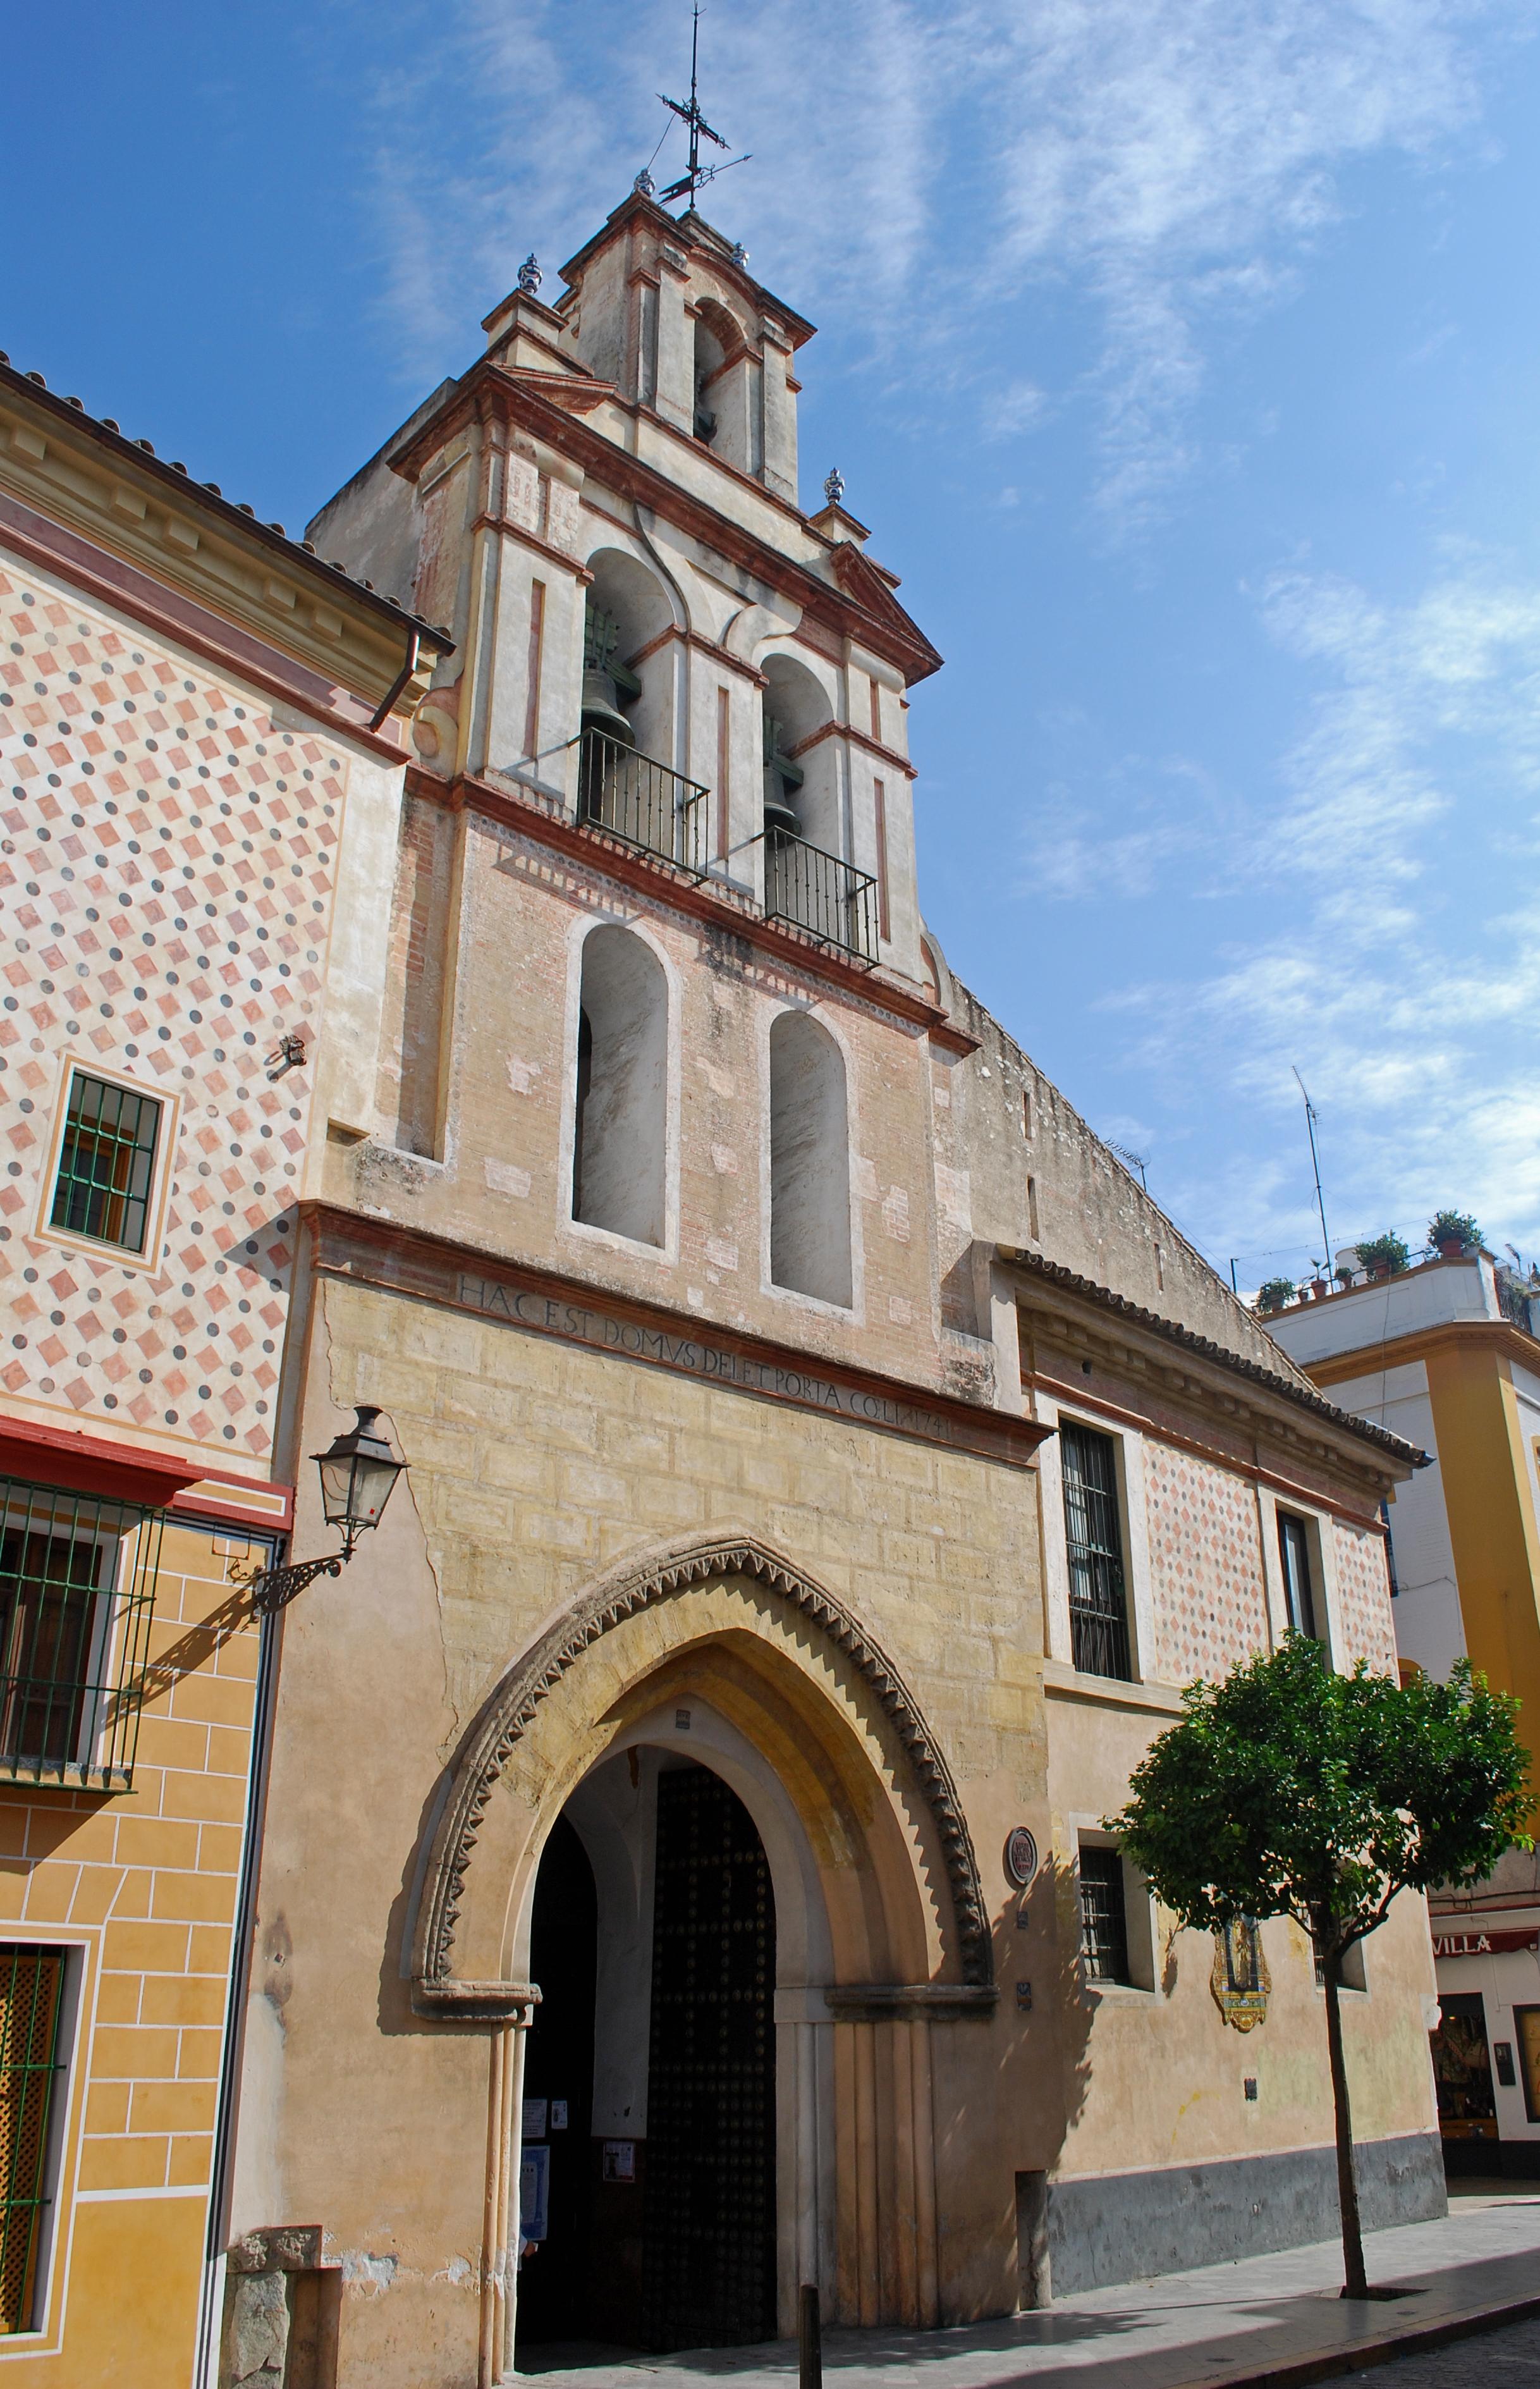 File:Iglesia de Santa María la Blanca, Sevilla.jpg - Wikimedia Commons